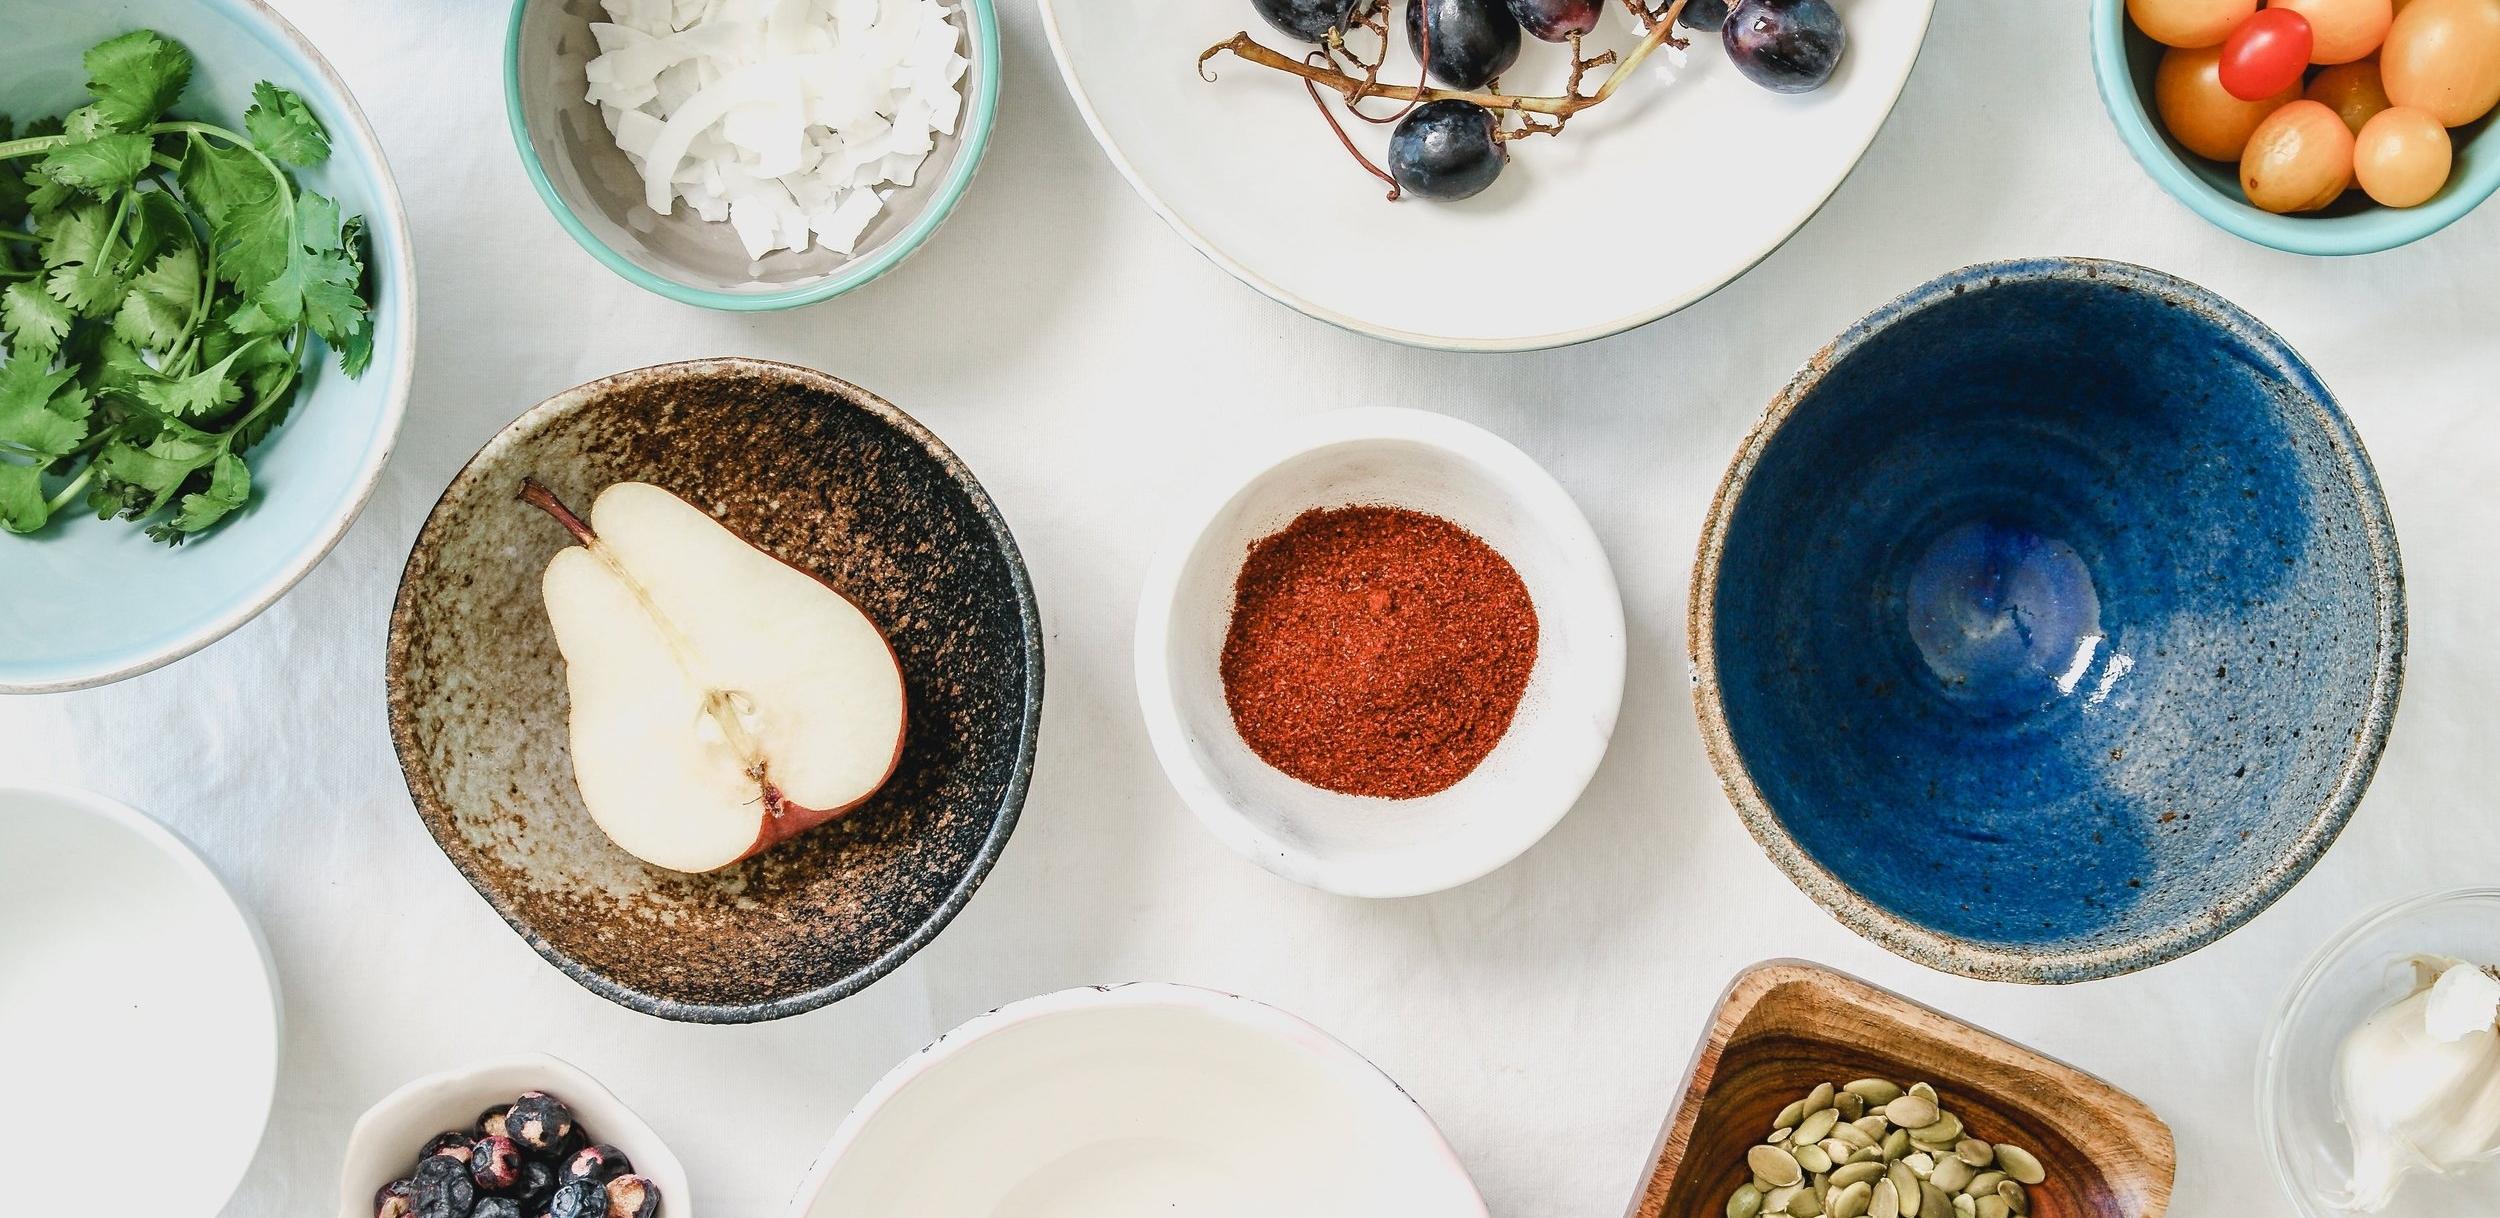 """Find the foods that love you back!"" - - Katrine van Wyk"